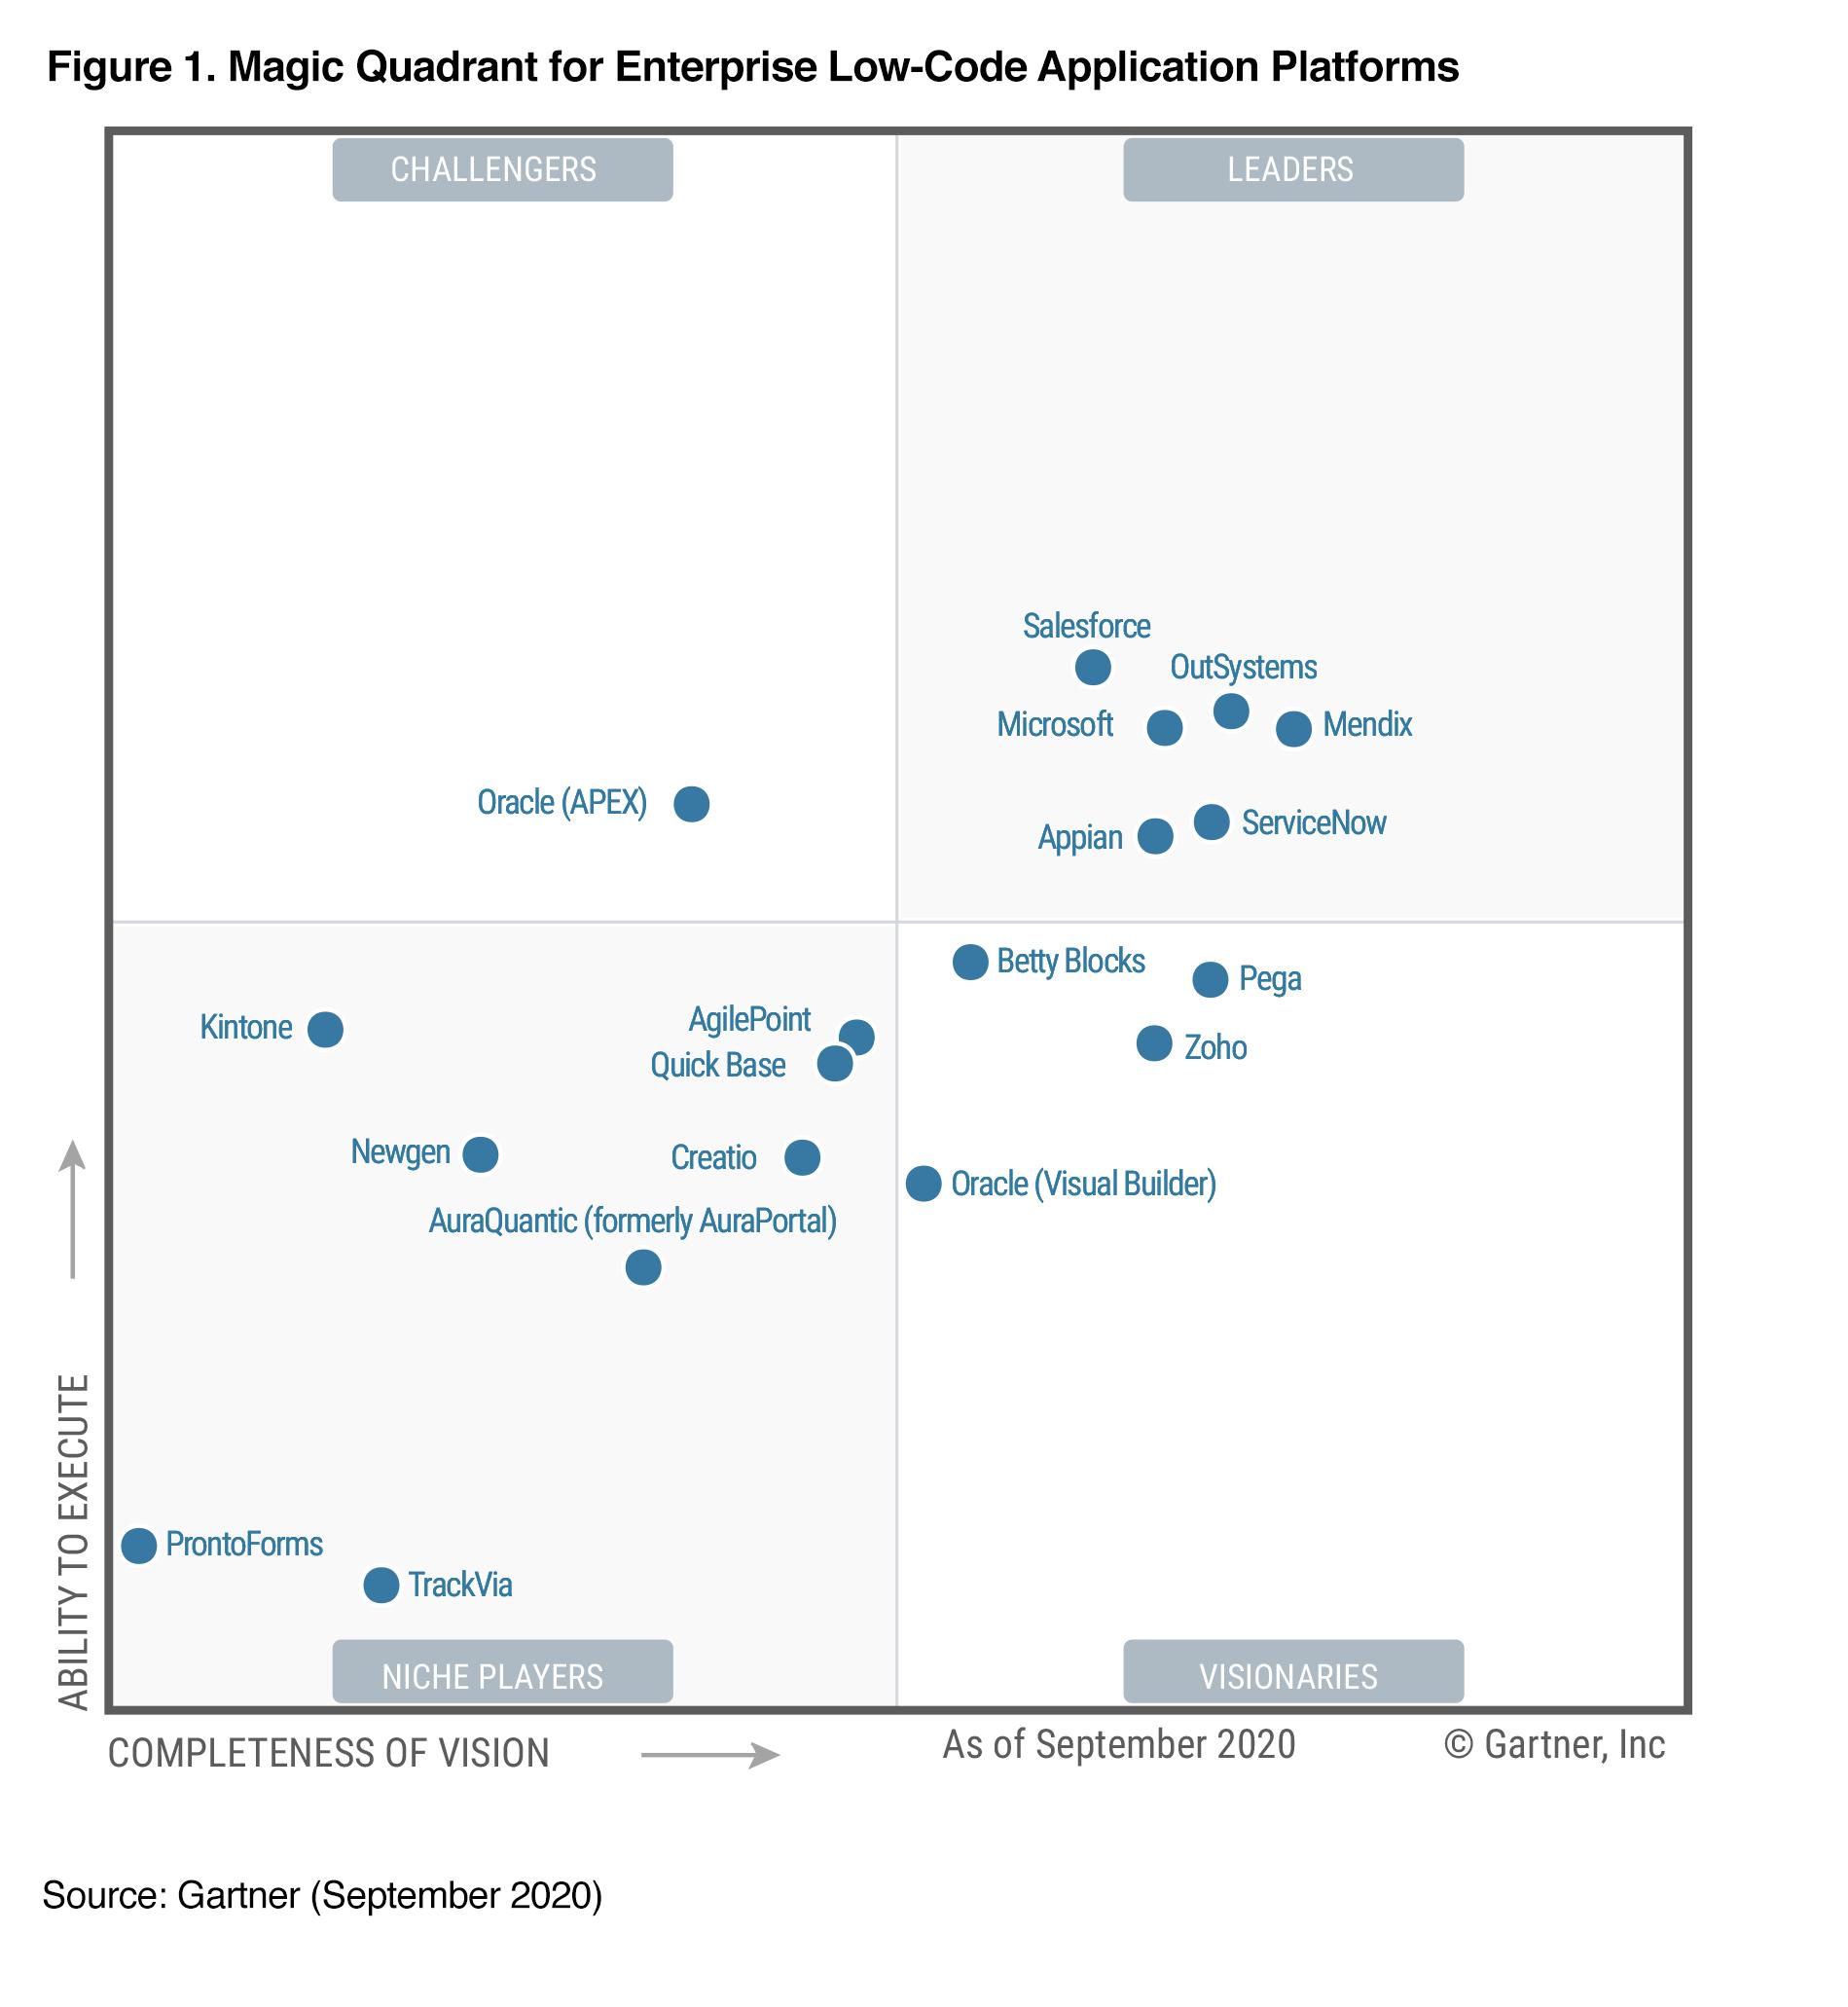 Magic Quadrant for Enterprise Low-Code Application Platforms - Gartner Inc